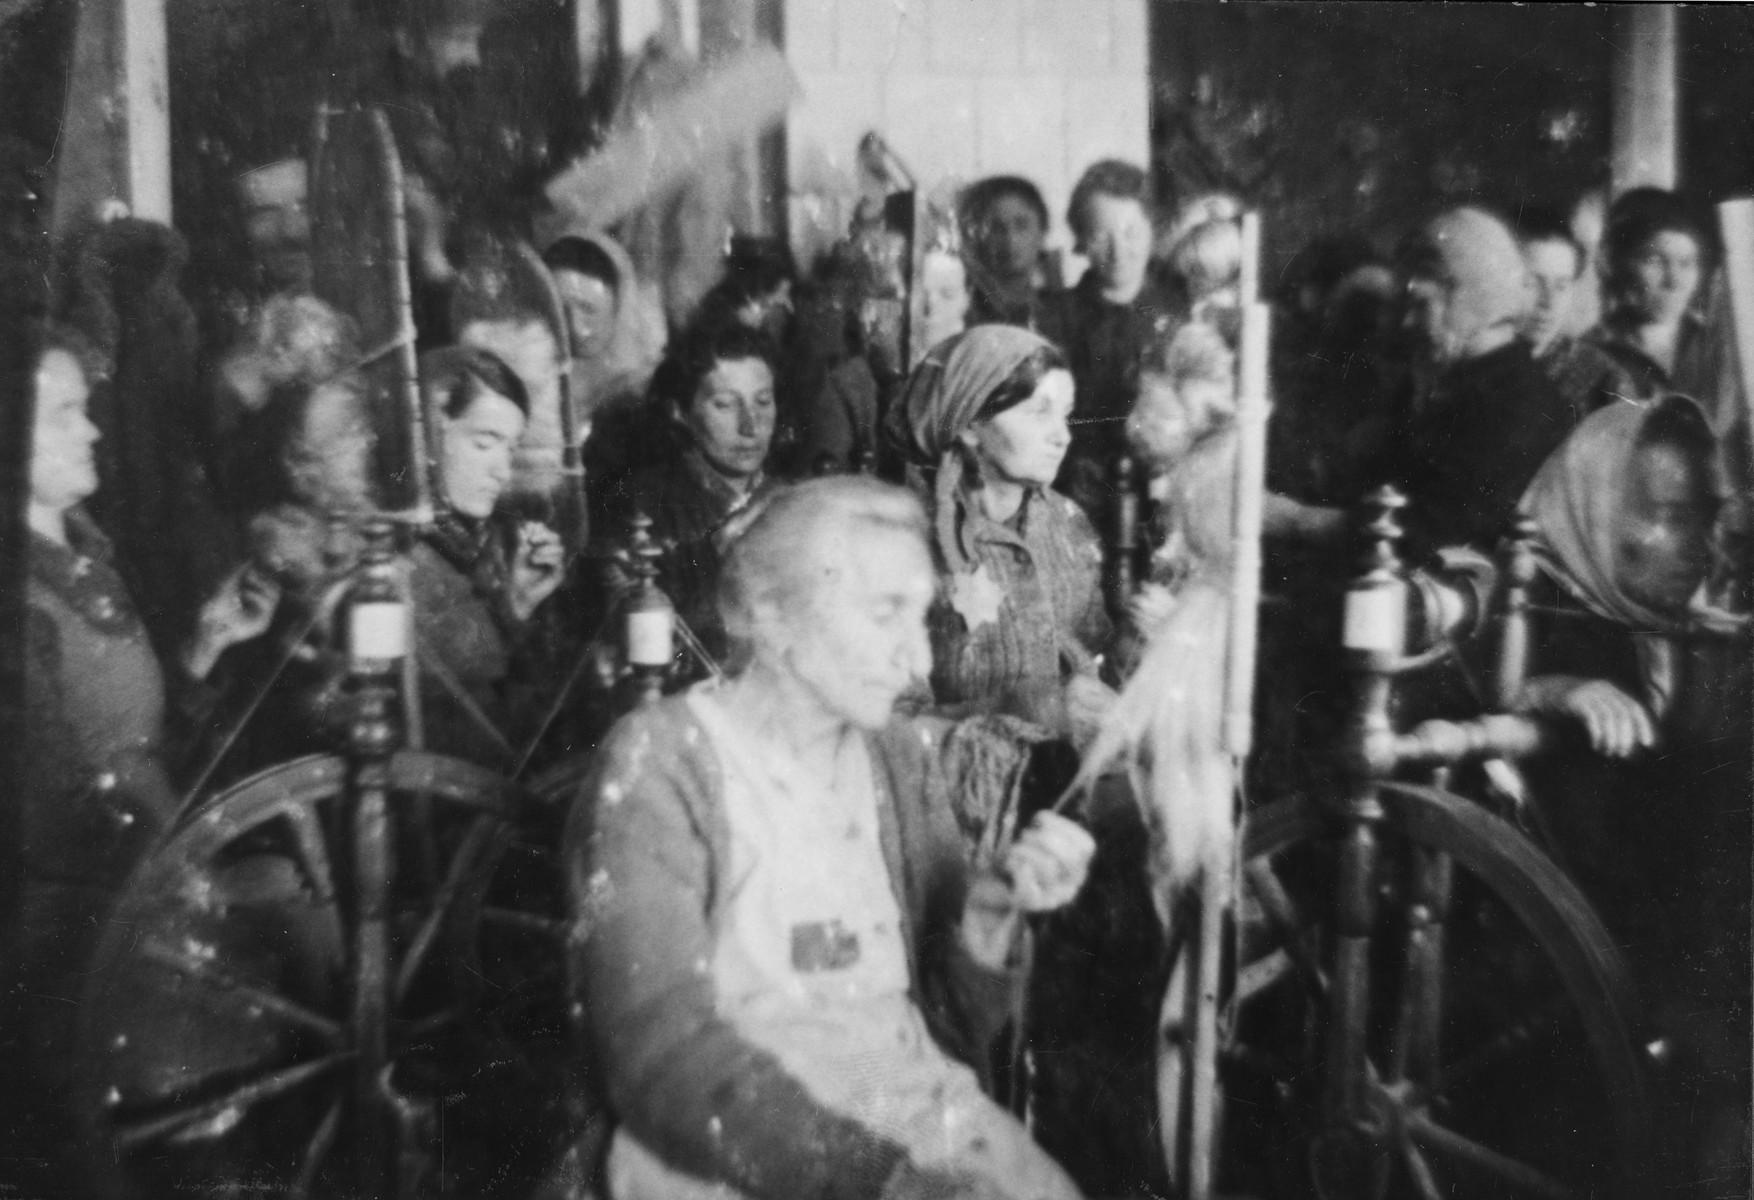 Jewish women at work spinning yarn in the Glubokoye ghetto.